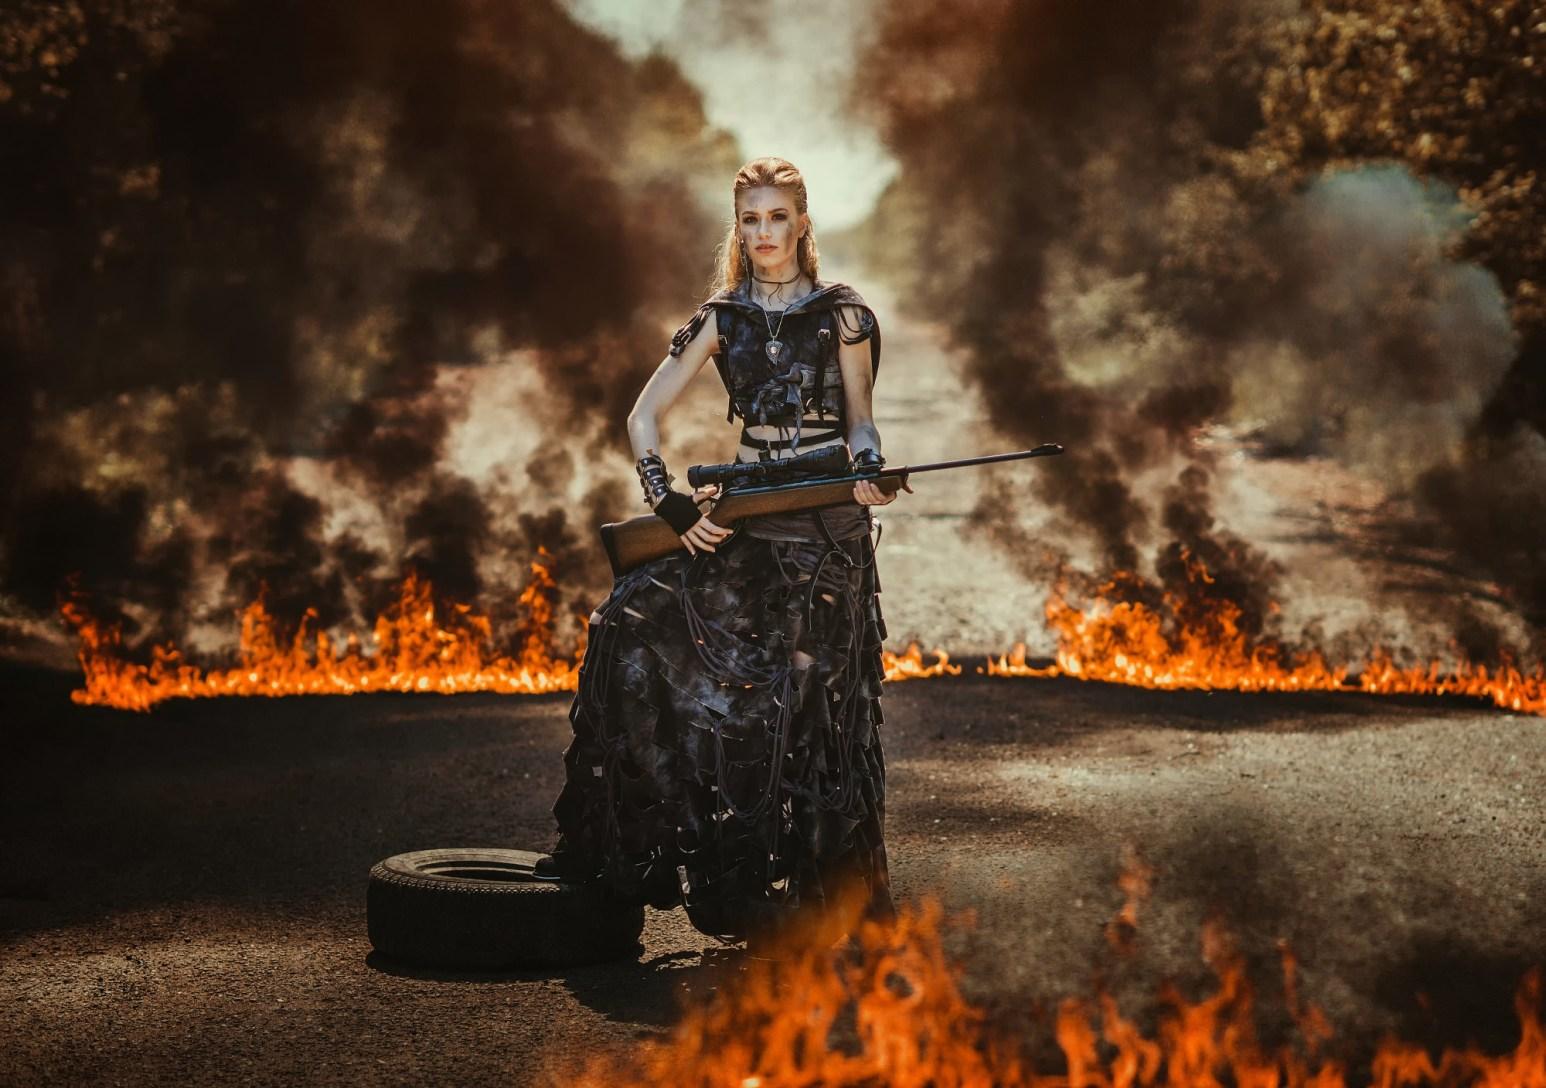 Rifle and Flame